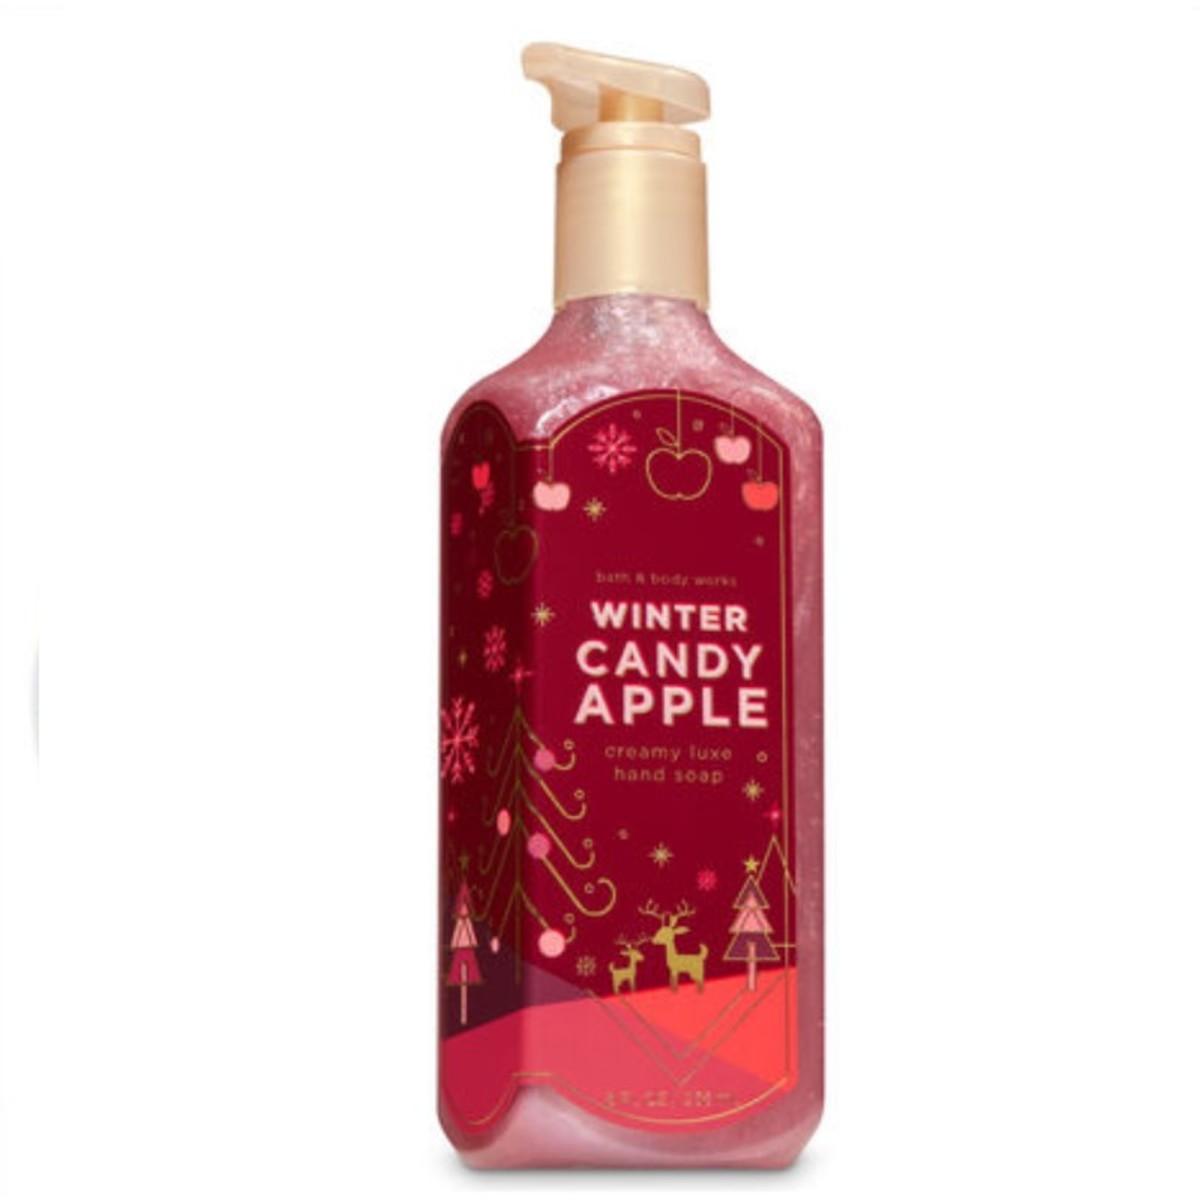 WINTER CANDY APPLE Creamy Luxe 洗手液(平行進口貨品)